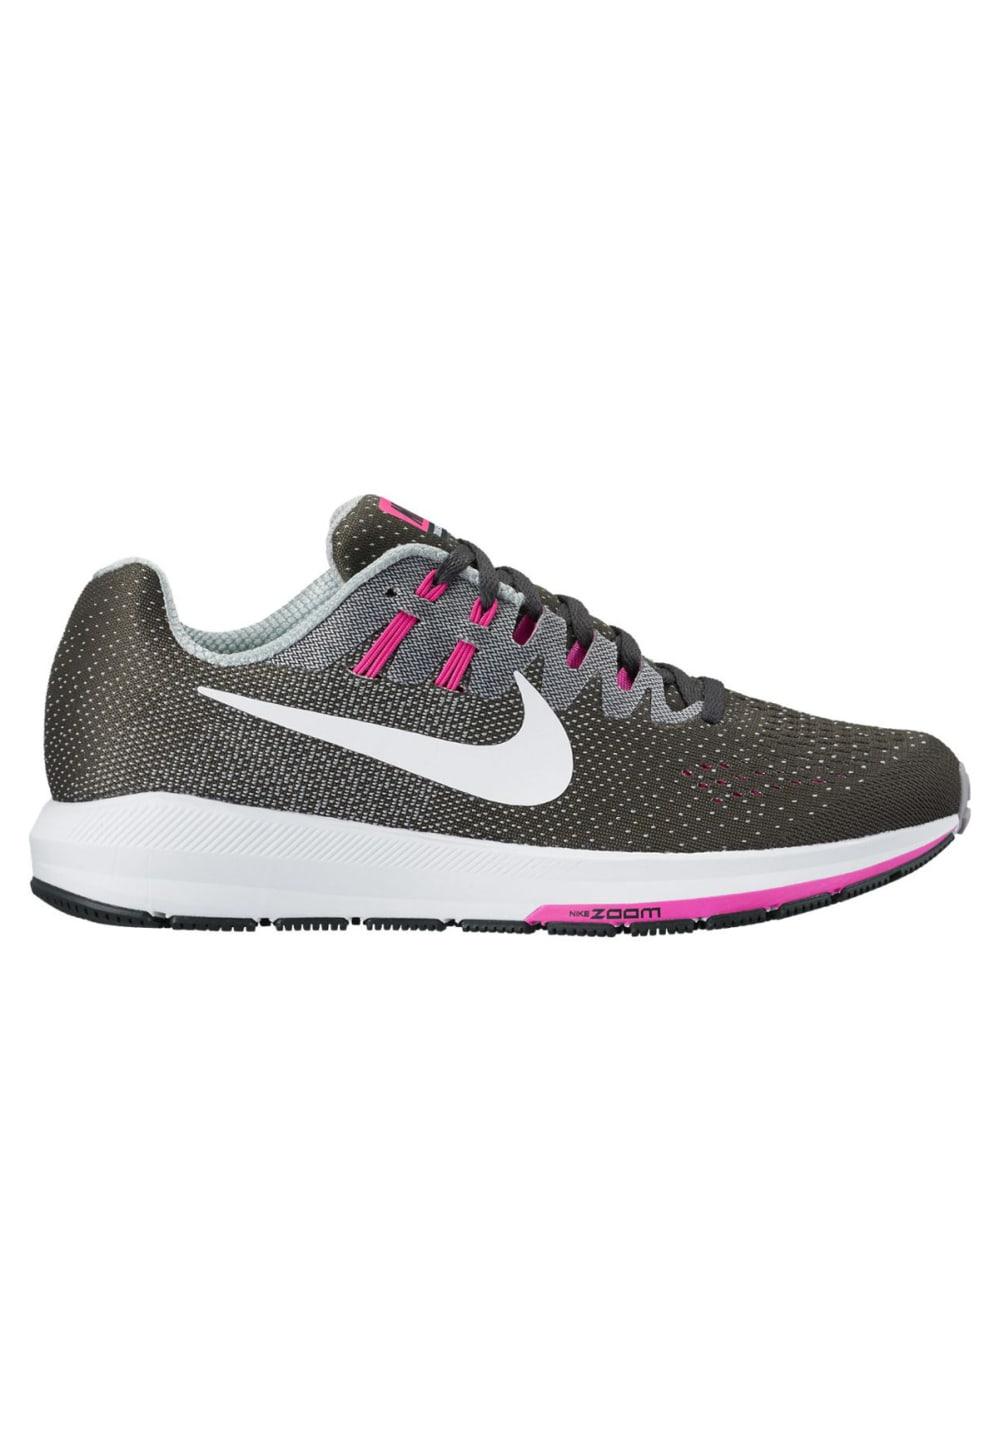 Nike Air Zoom Structure 20 Laufschuhe für Damen Grau